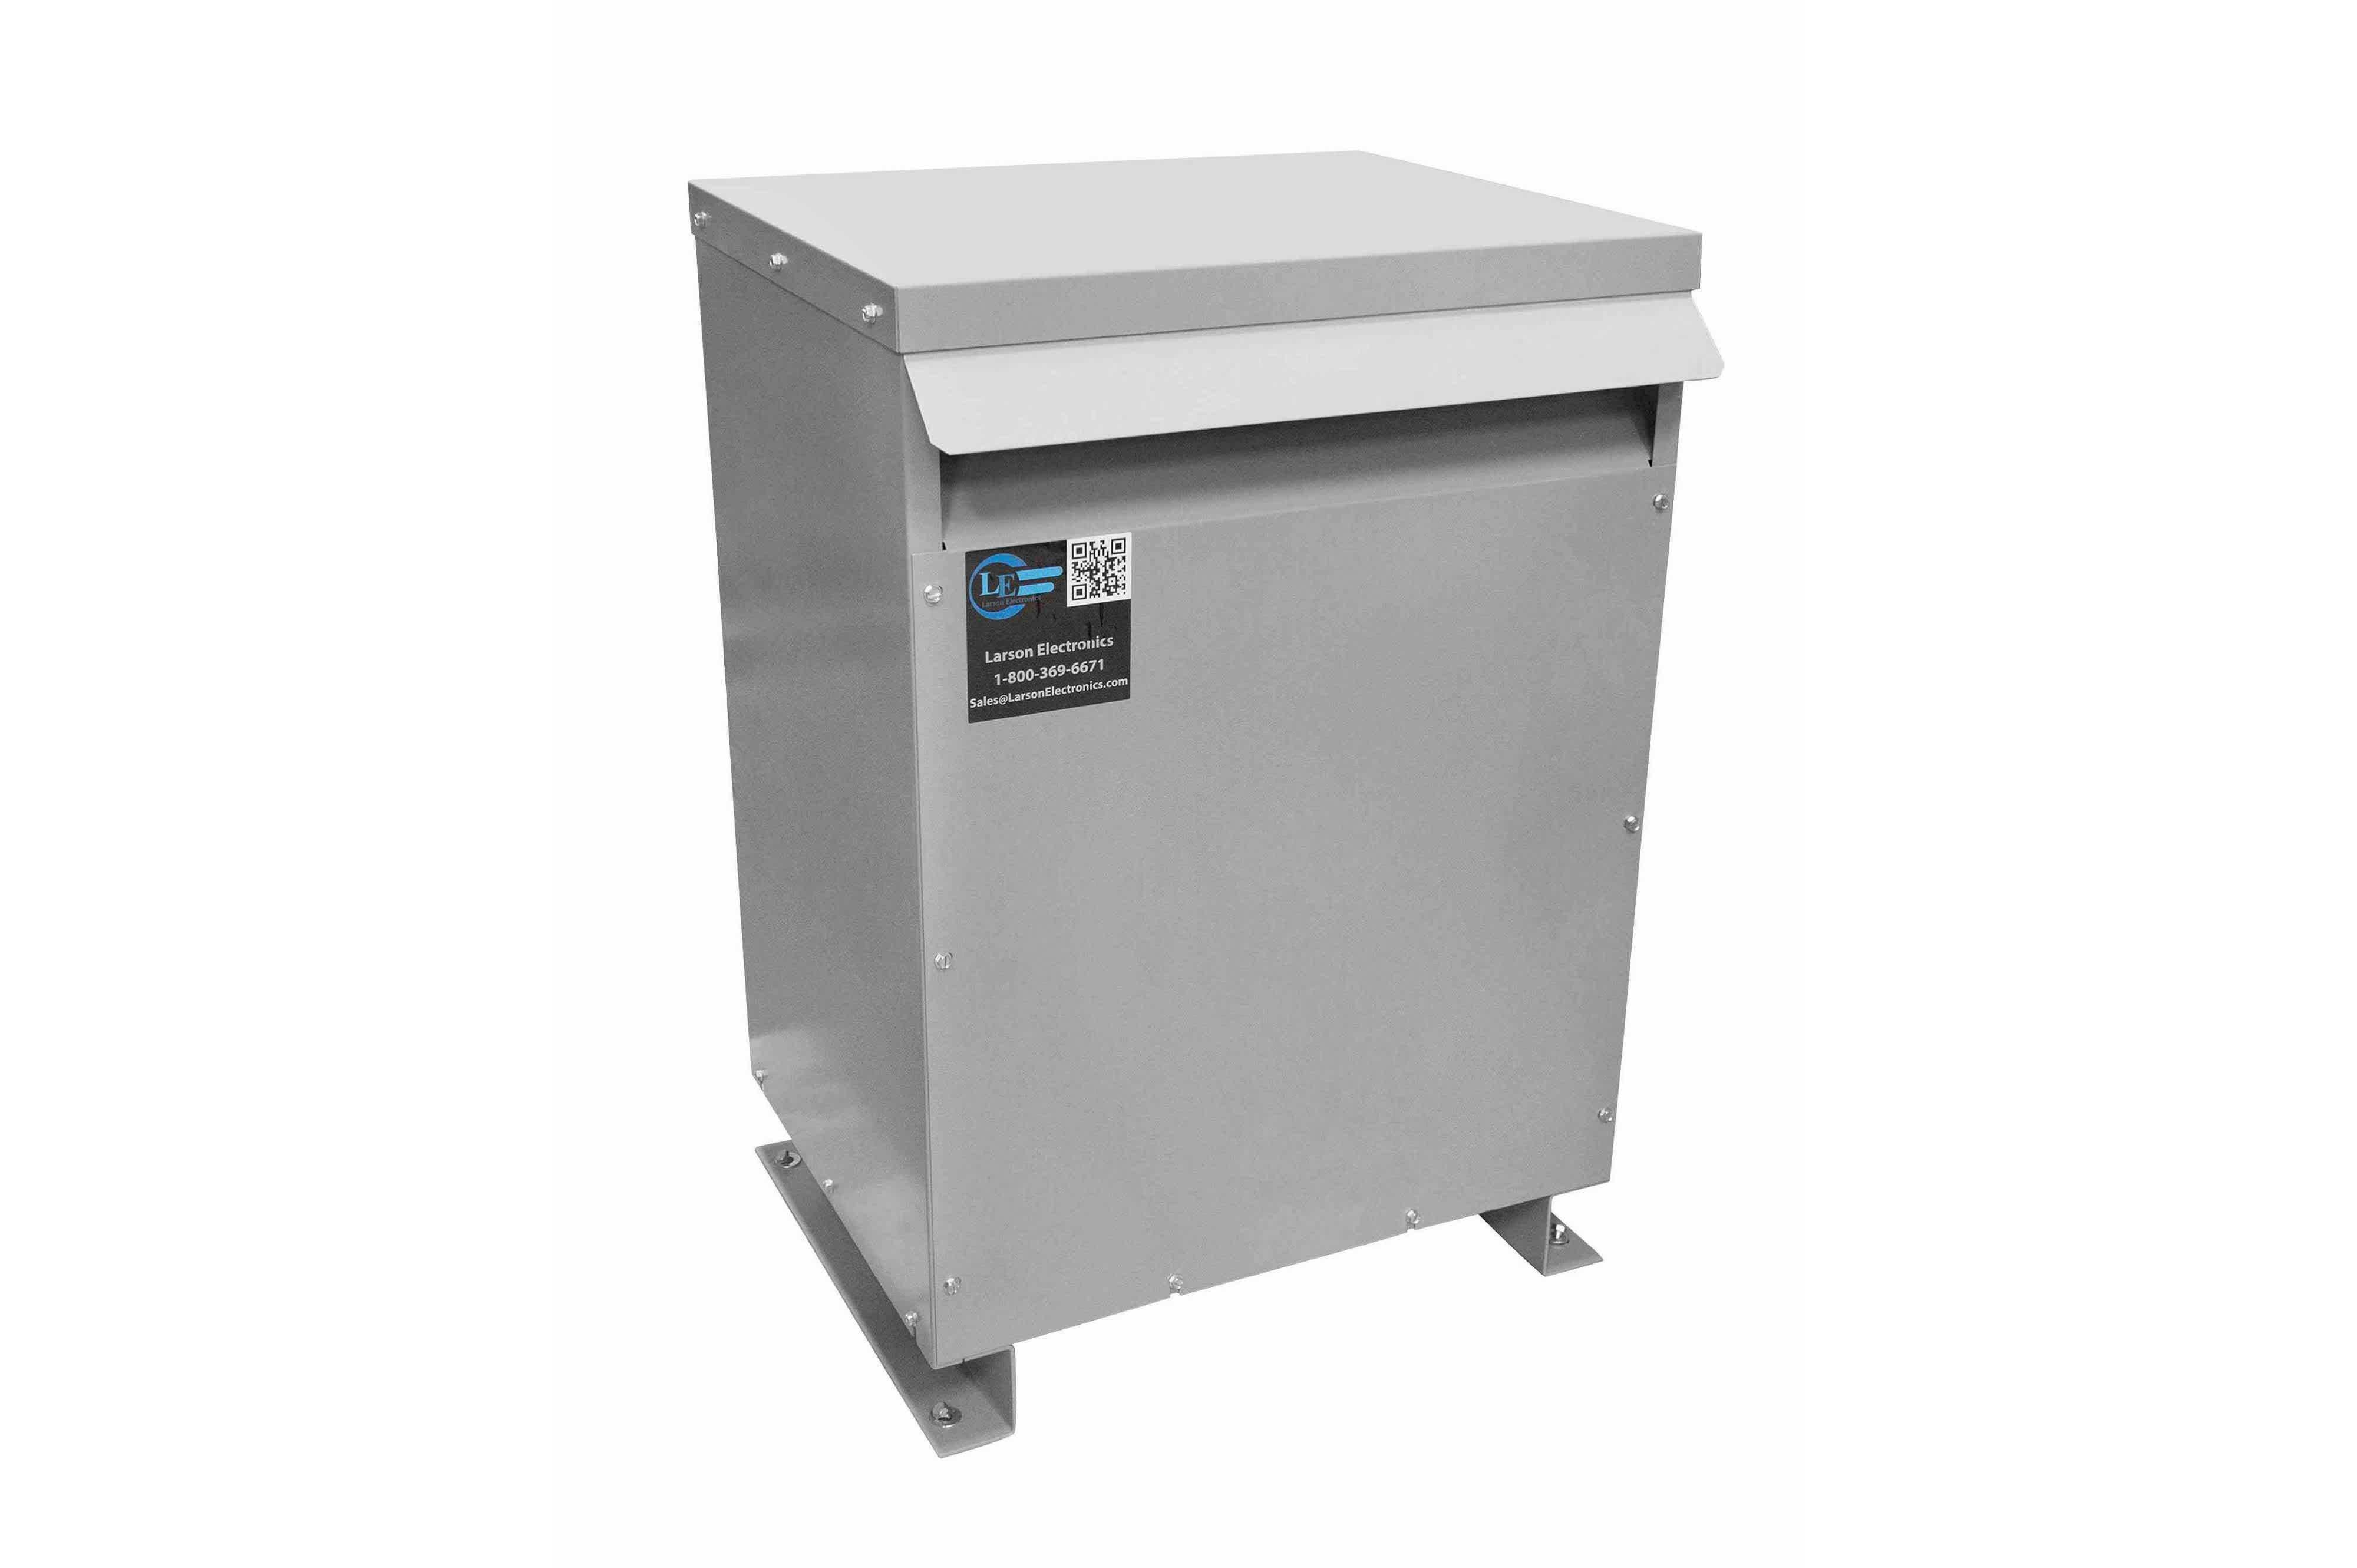 125 kVA 3PH Isolation Transformer, 460V Wye Primary, 400V Delta Secondary, N3R, Ventilated, 60 Hz